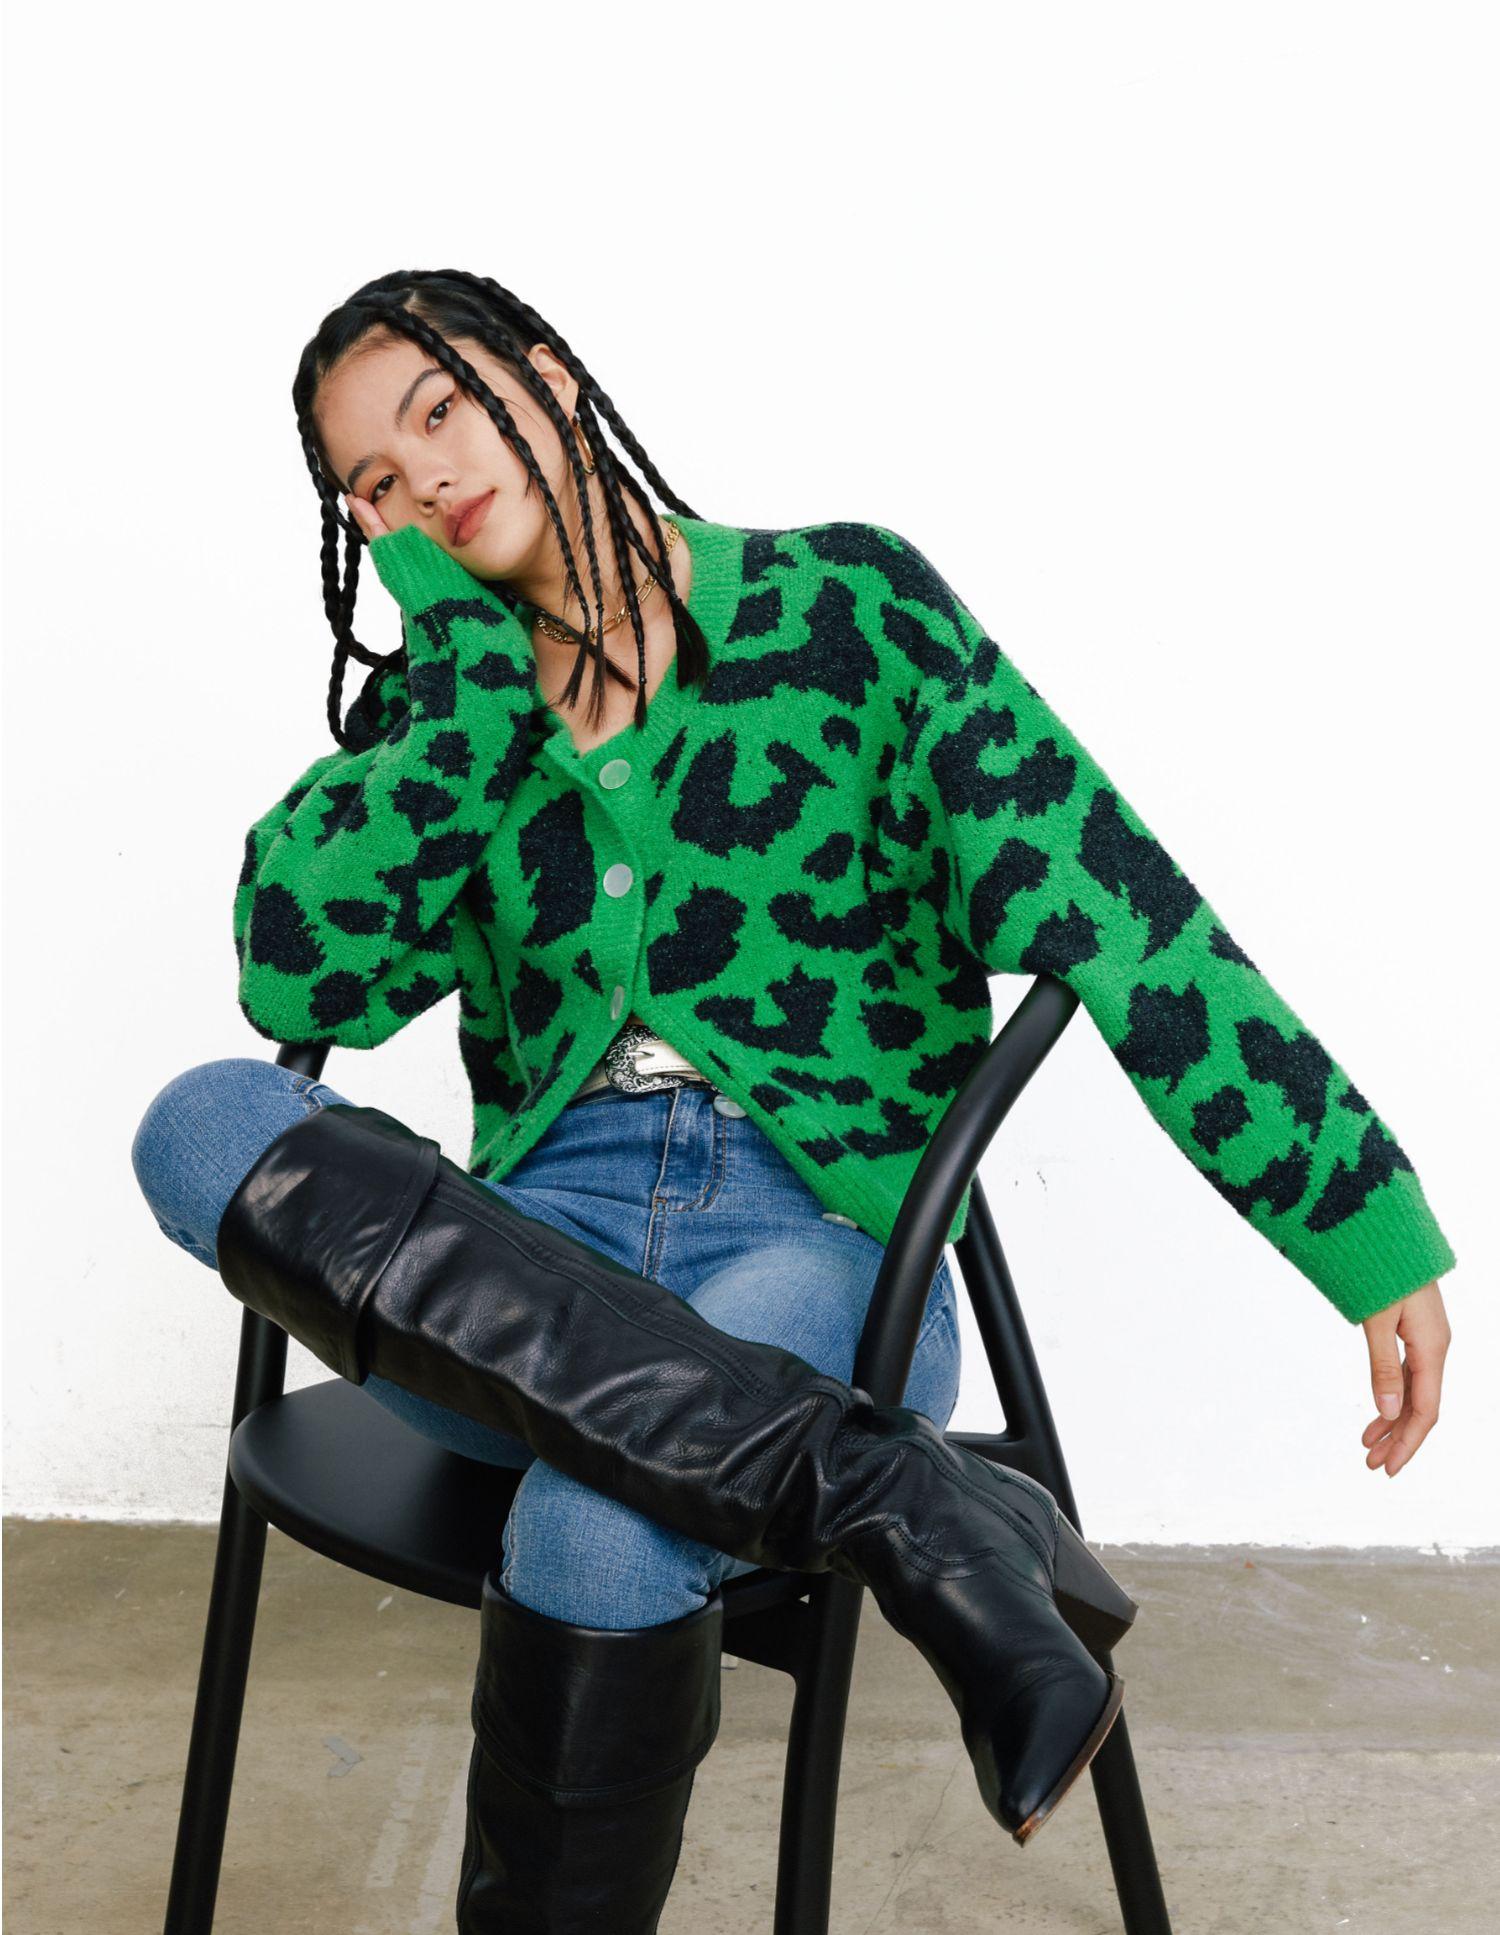 Tiptoe&Roll綠色豹紋MAE Sweater毛衣短開衫寬松復古法式小惠女裝鋪!!!